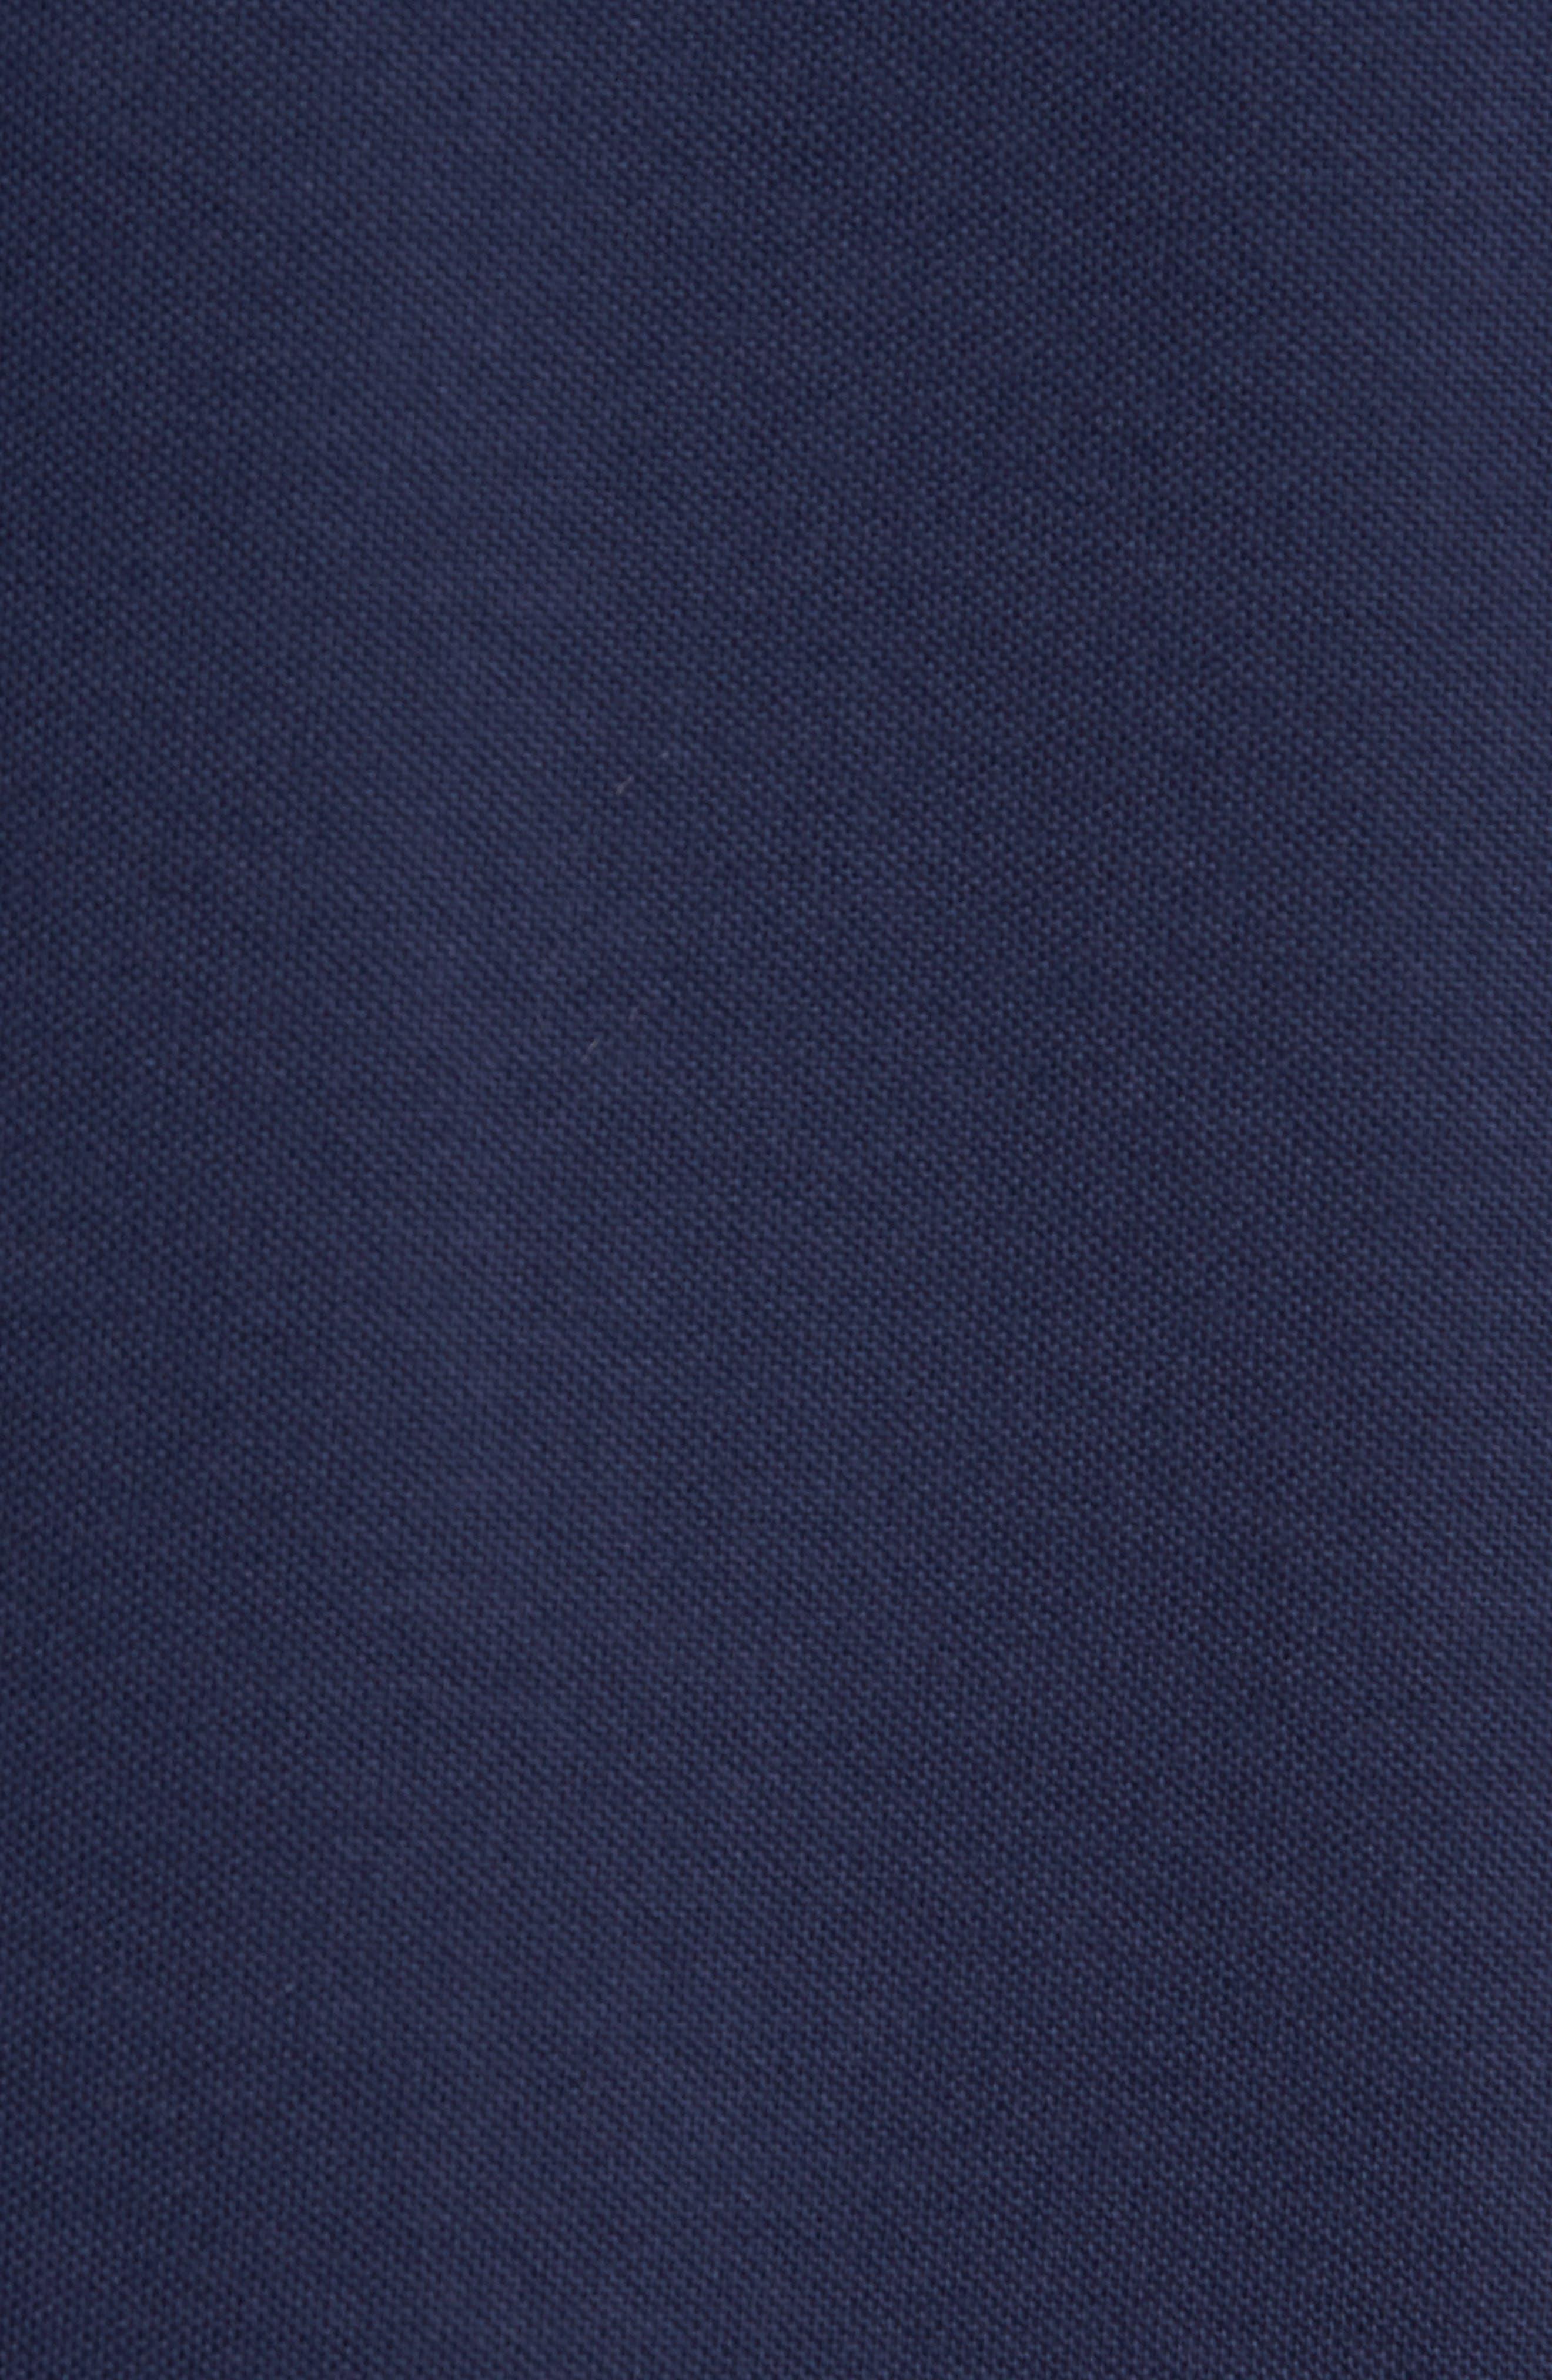 Bomber Collar Piqué Shirt,                             Alternate thumbnail 5, color,                             Carbon Blue